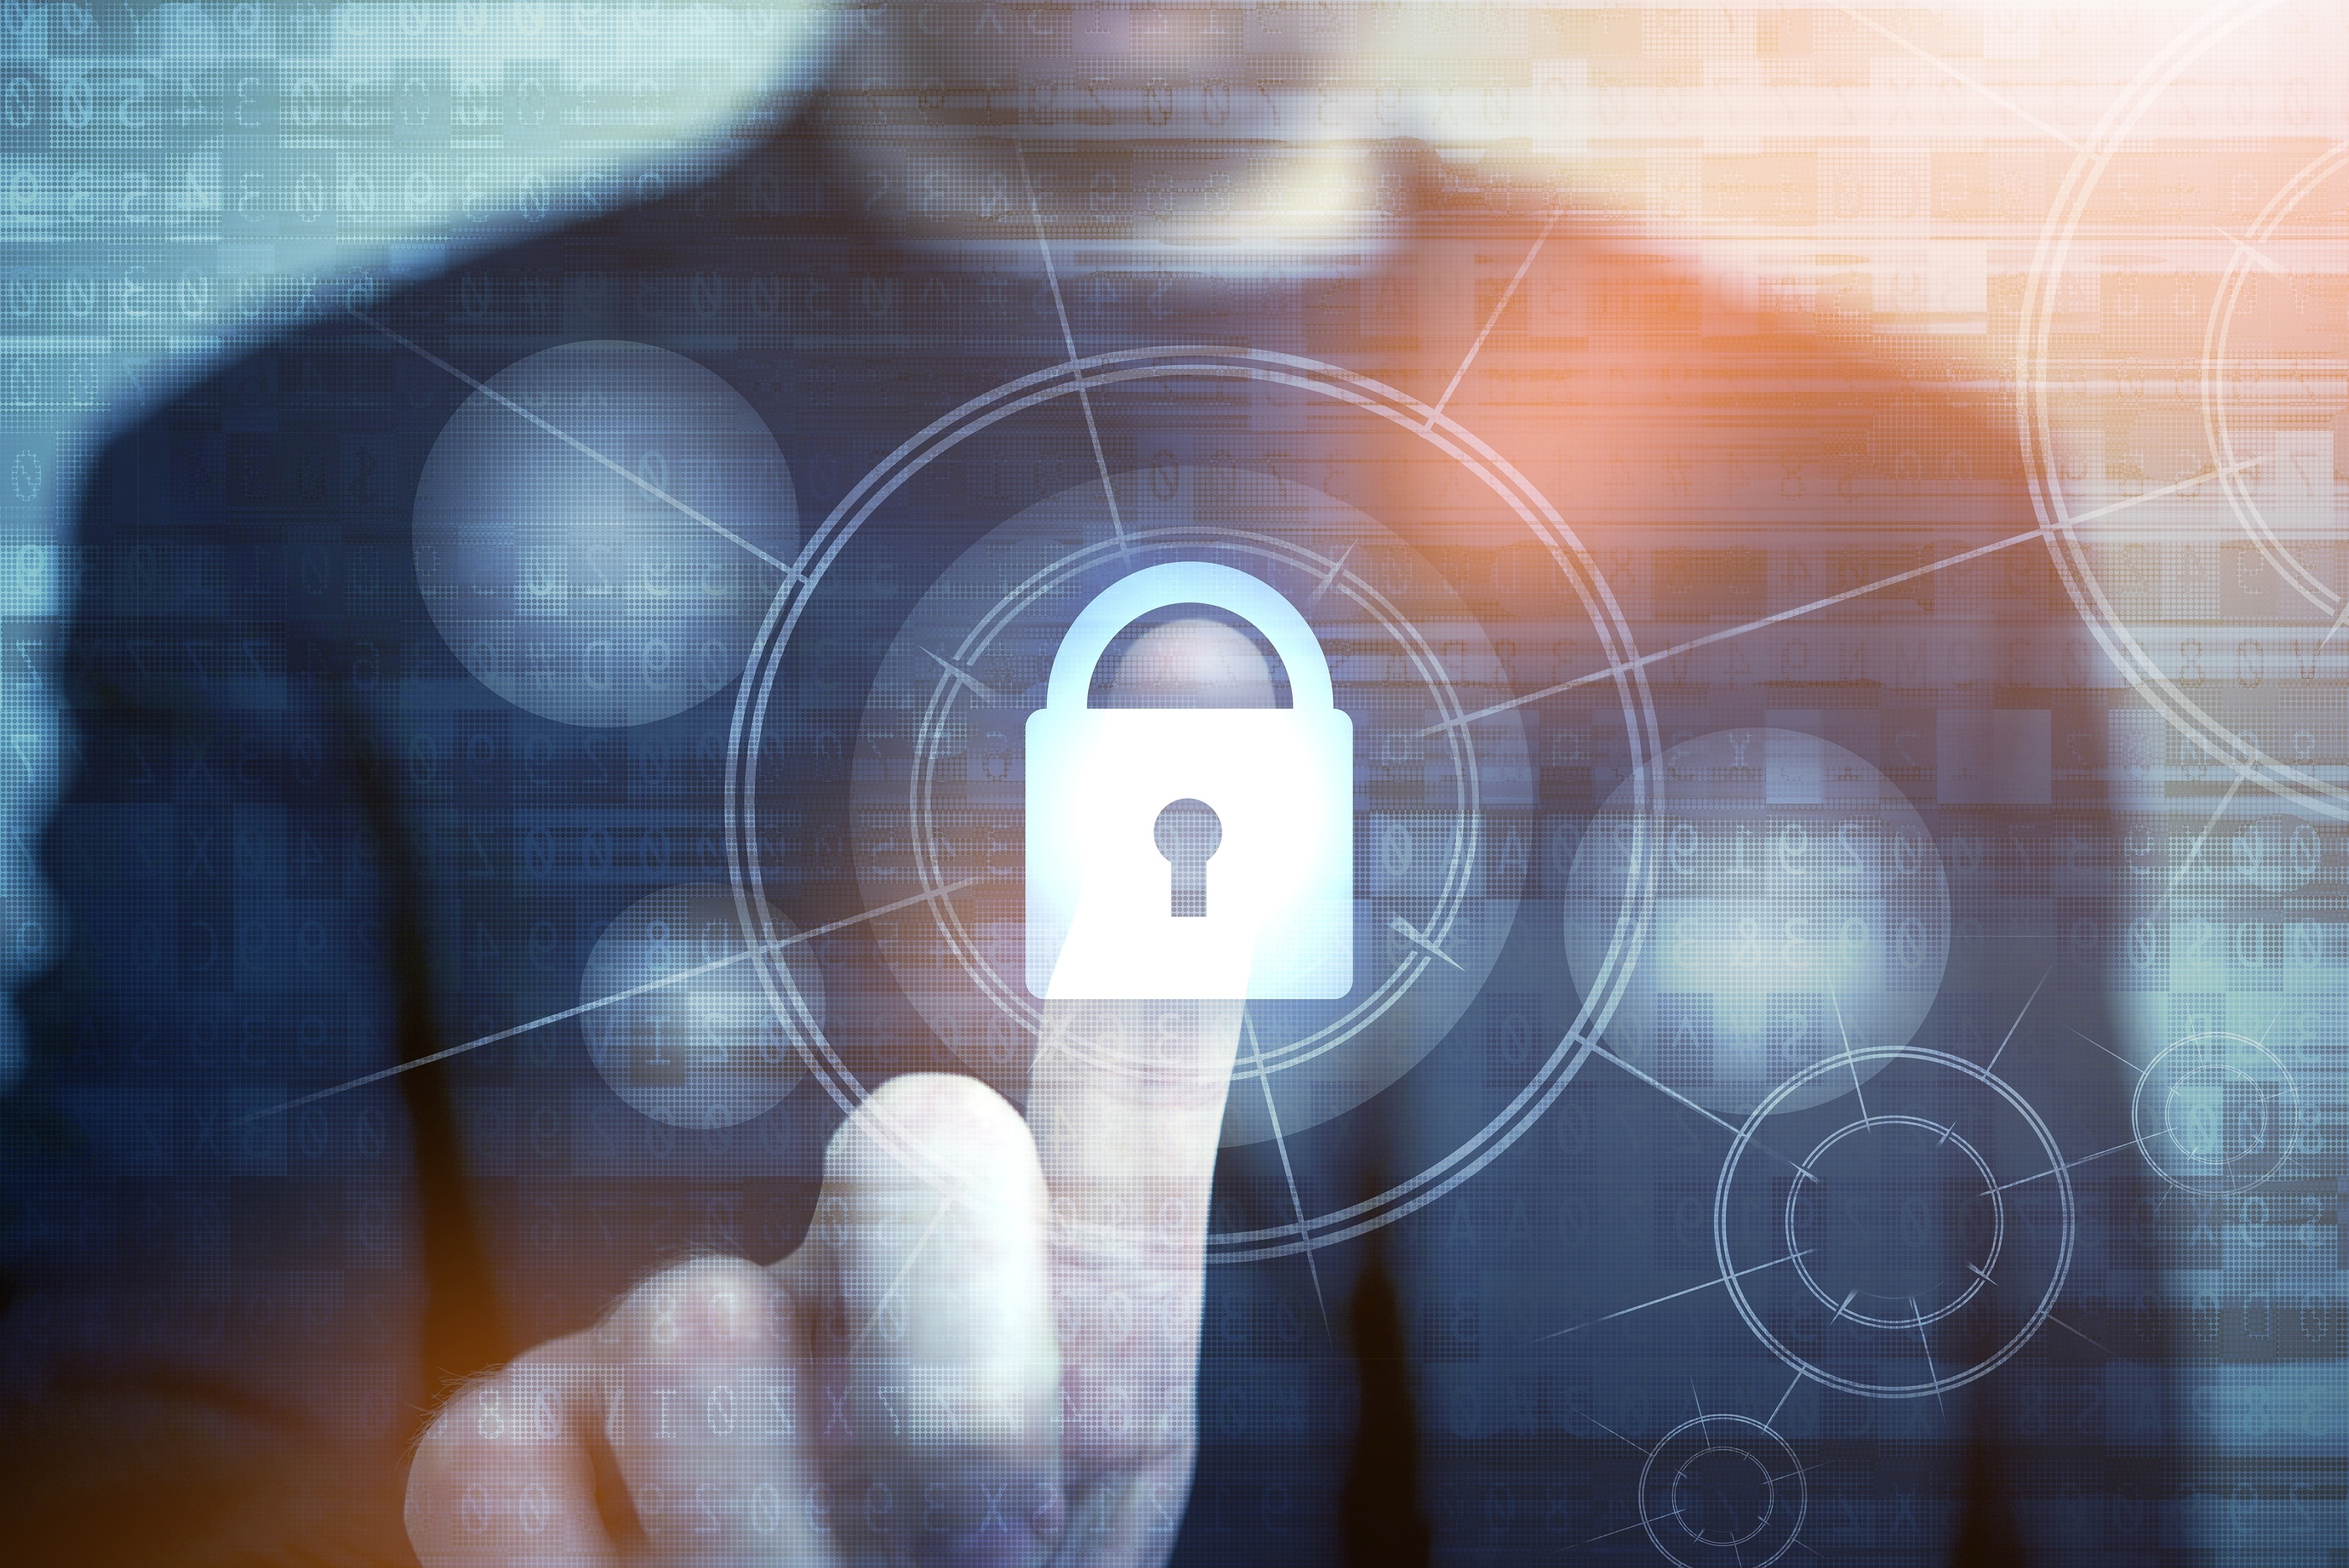 bigstock-Network-Safety-Concept-112864718.jpg